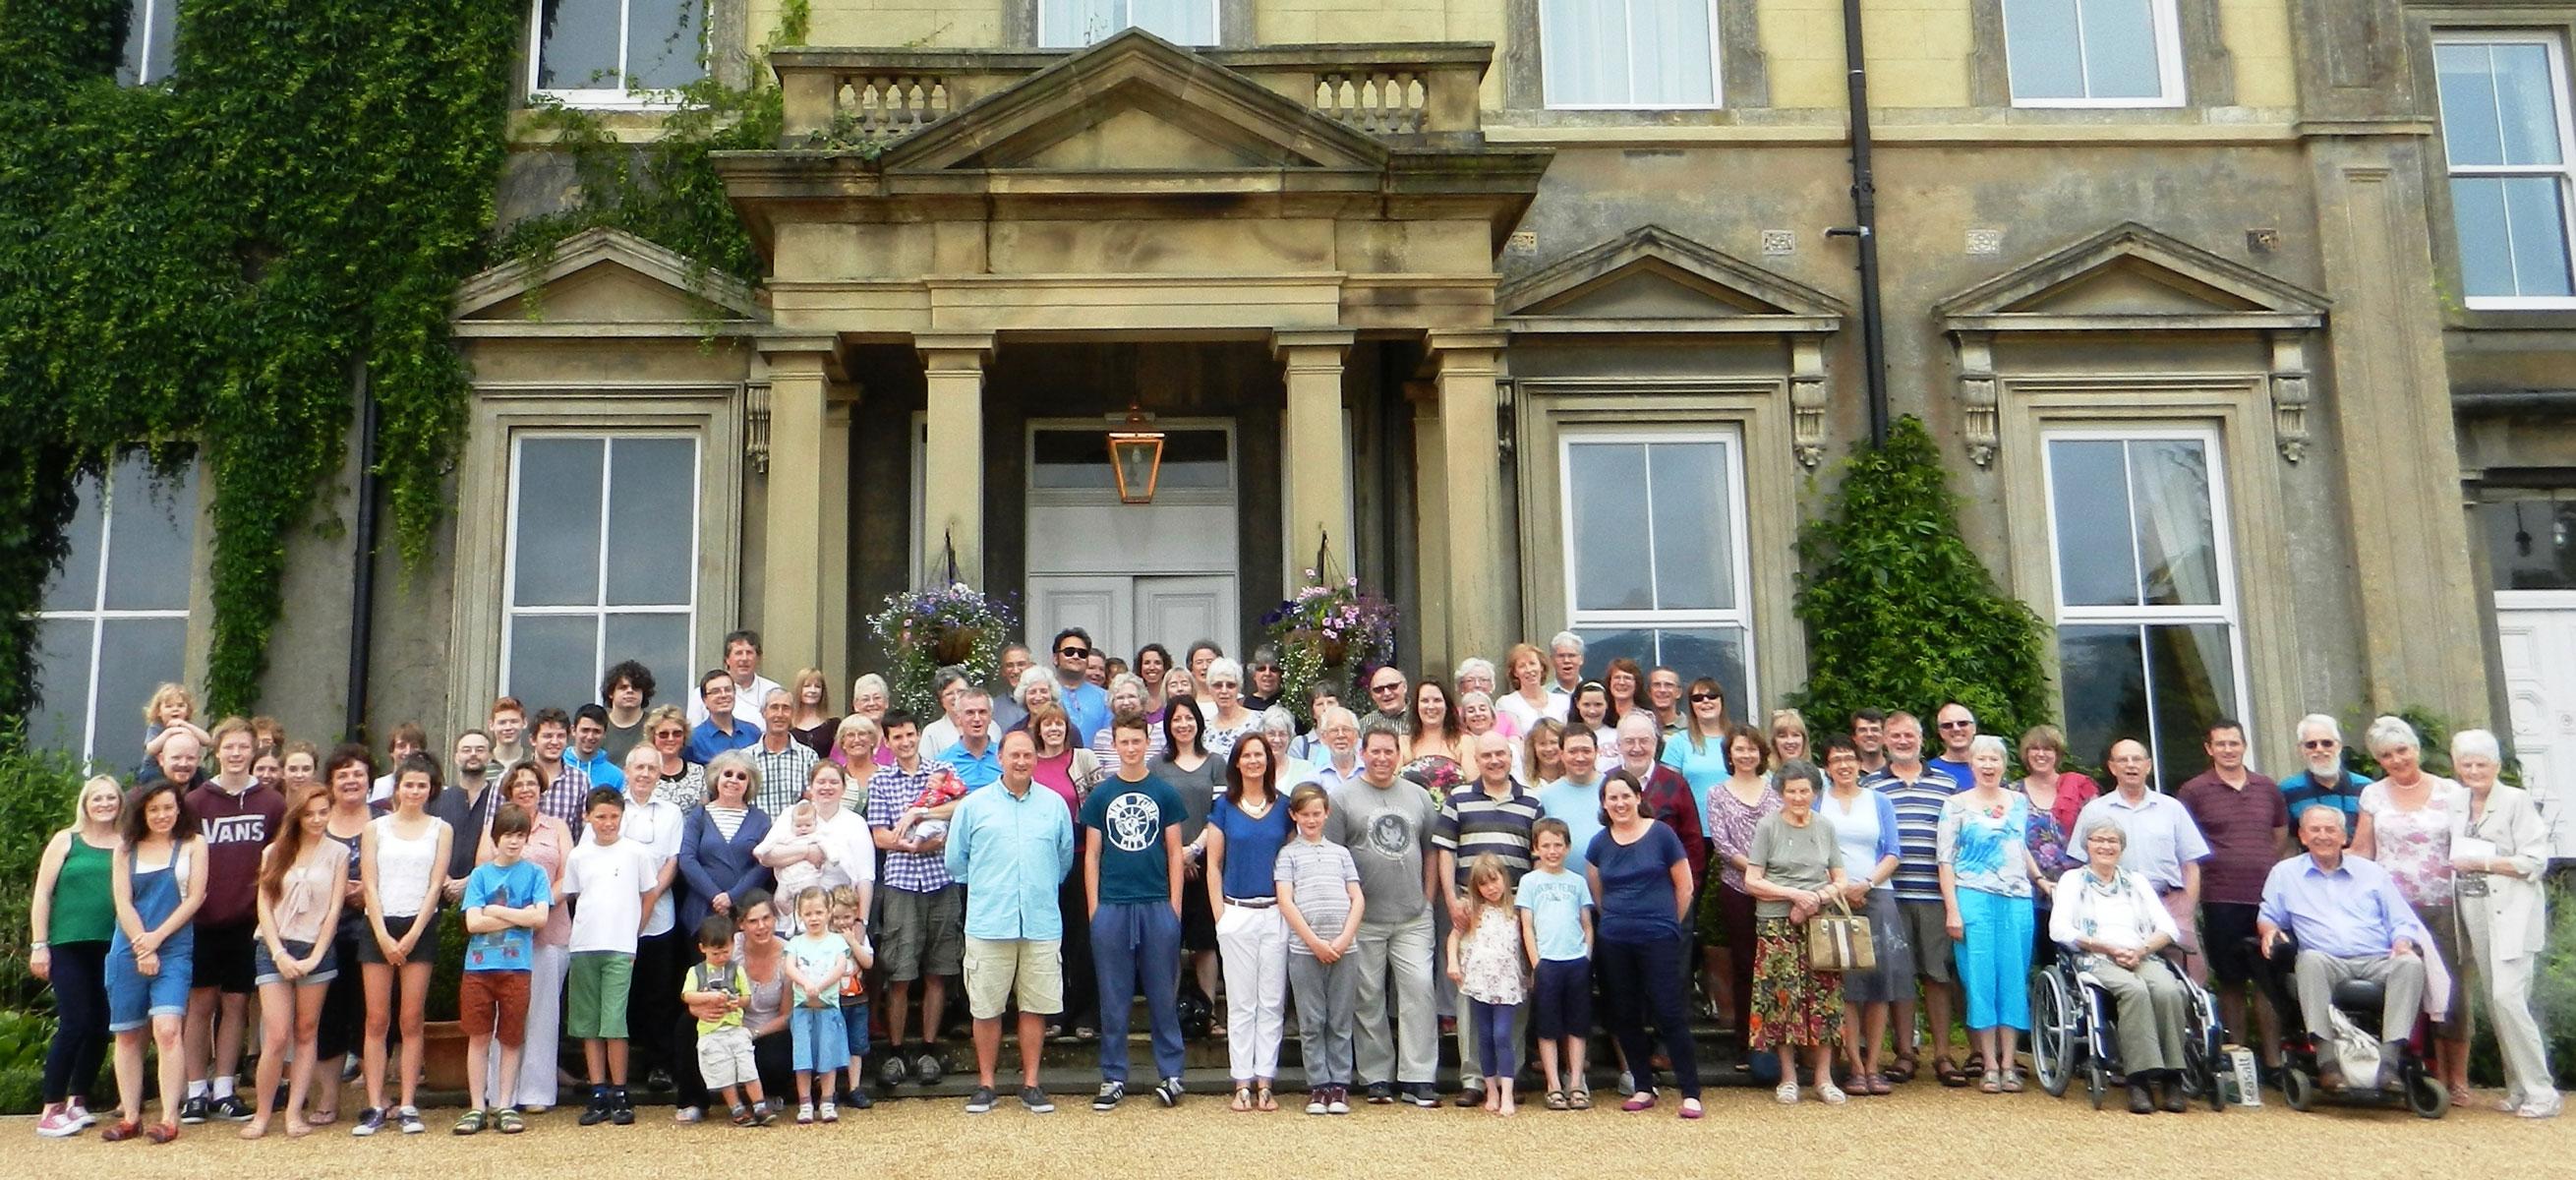 Duffield-Church-Family